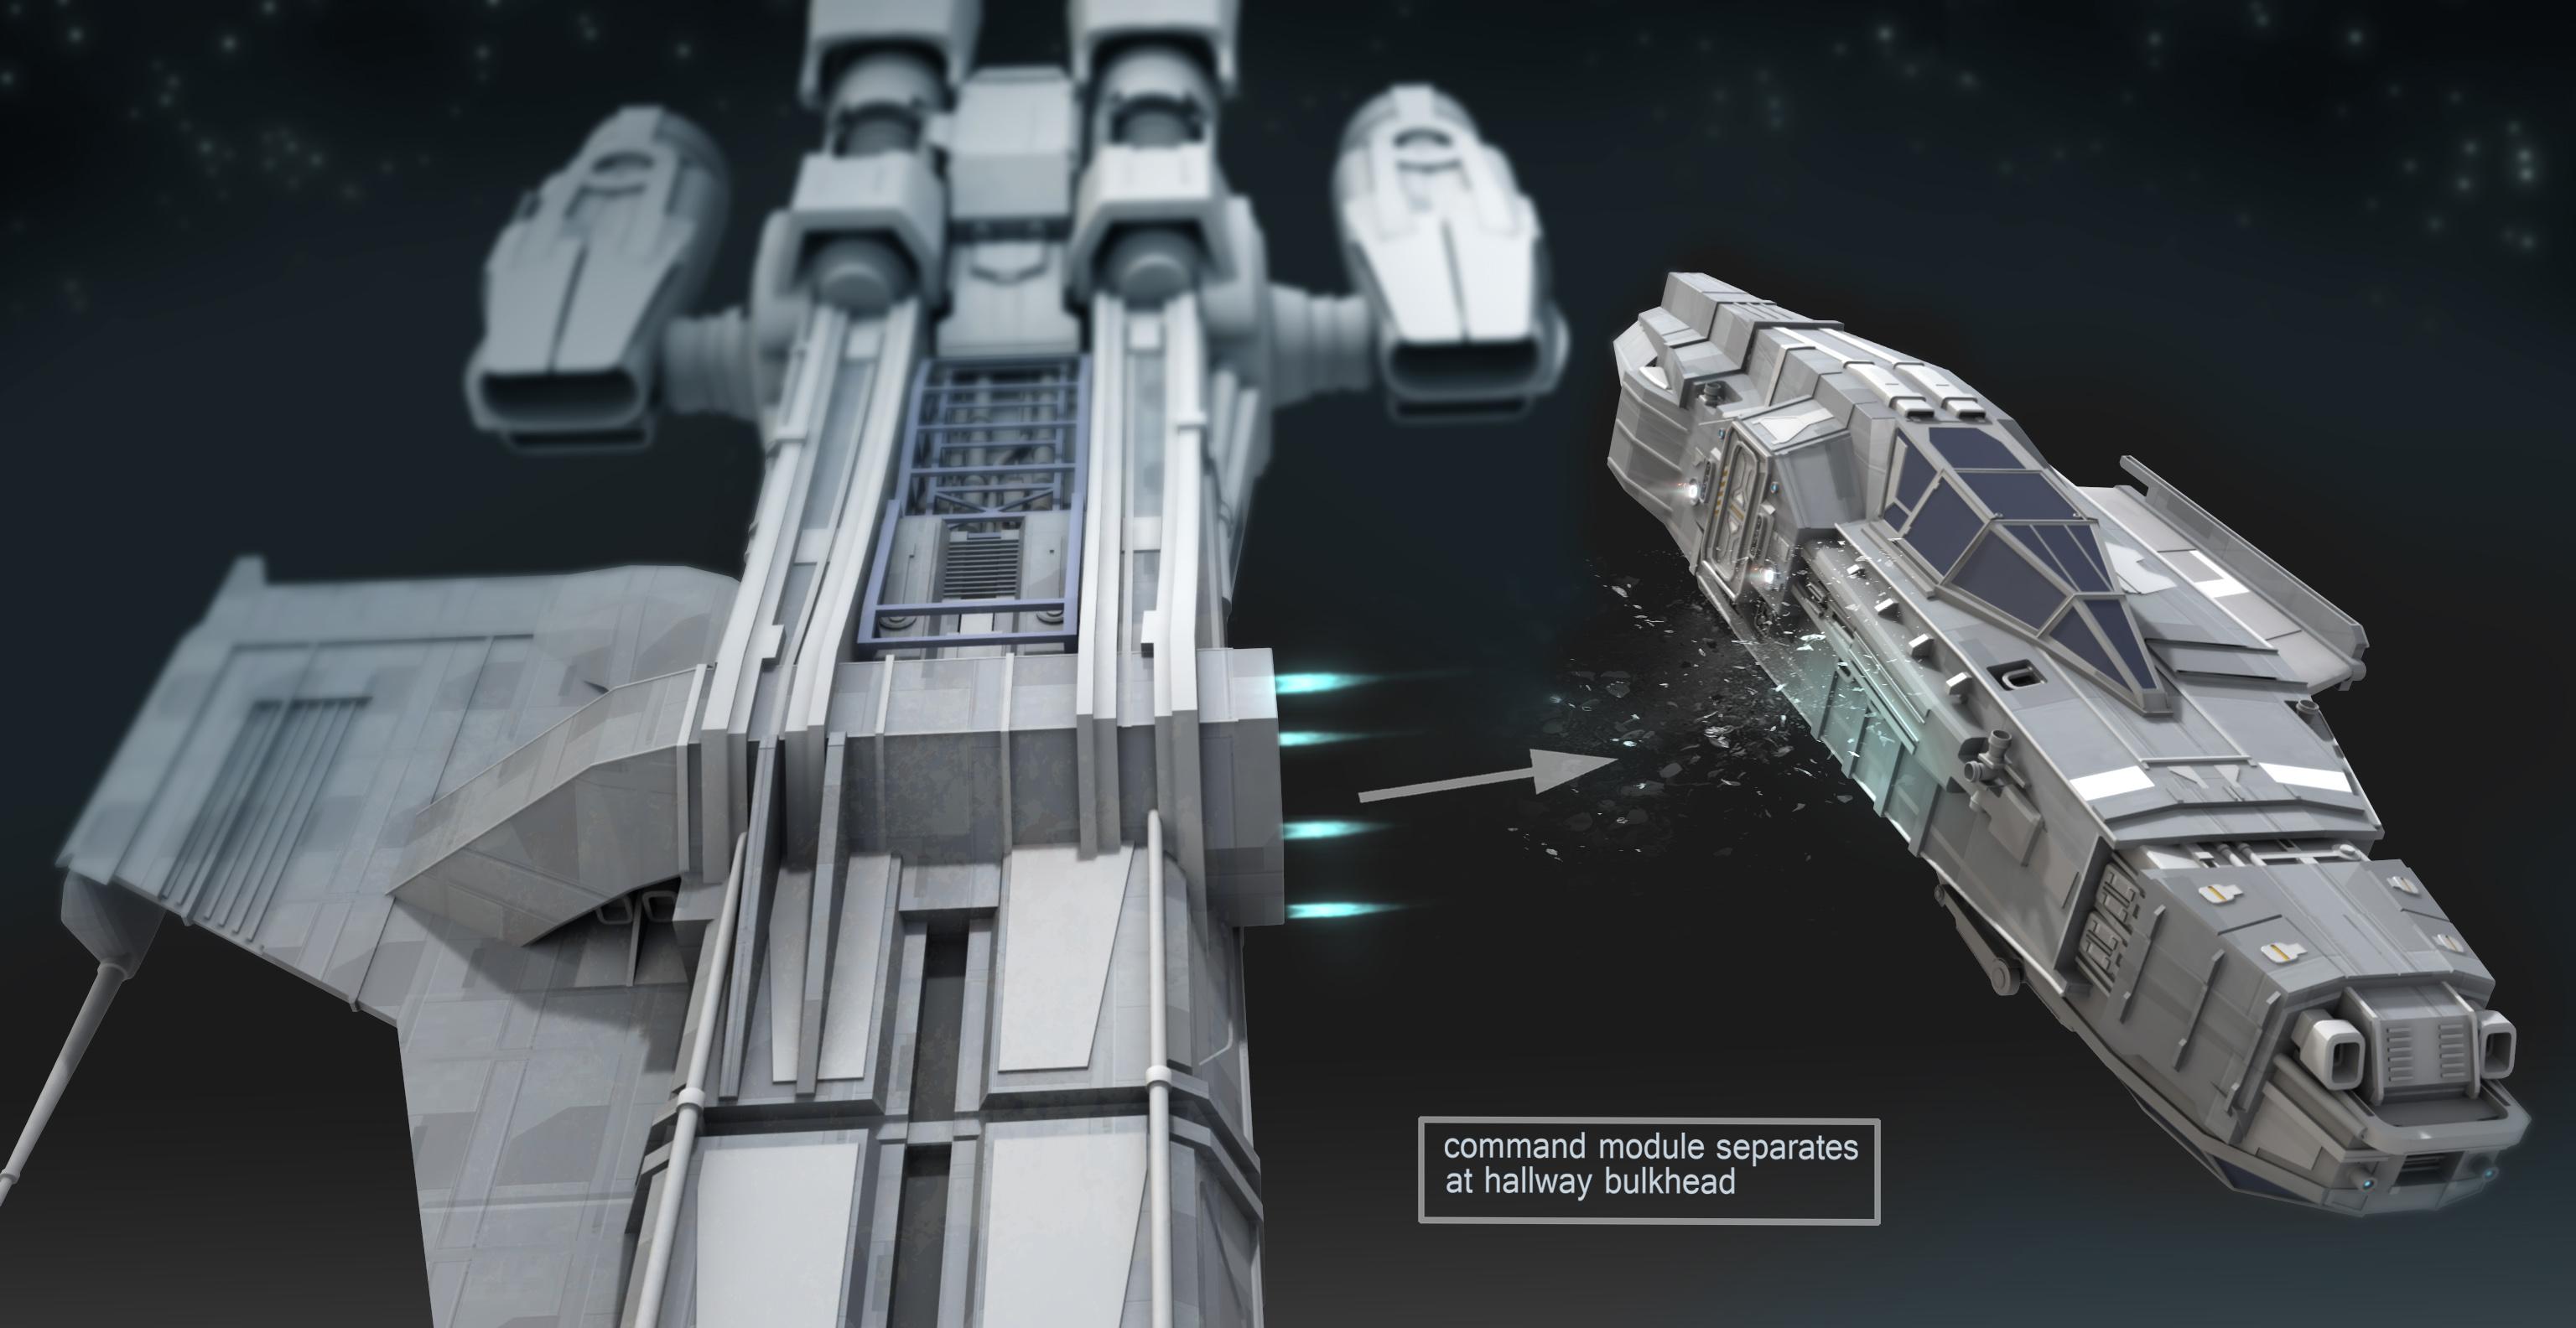 Caterpillar-Separated-Command-Module03.j